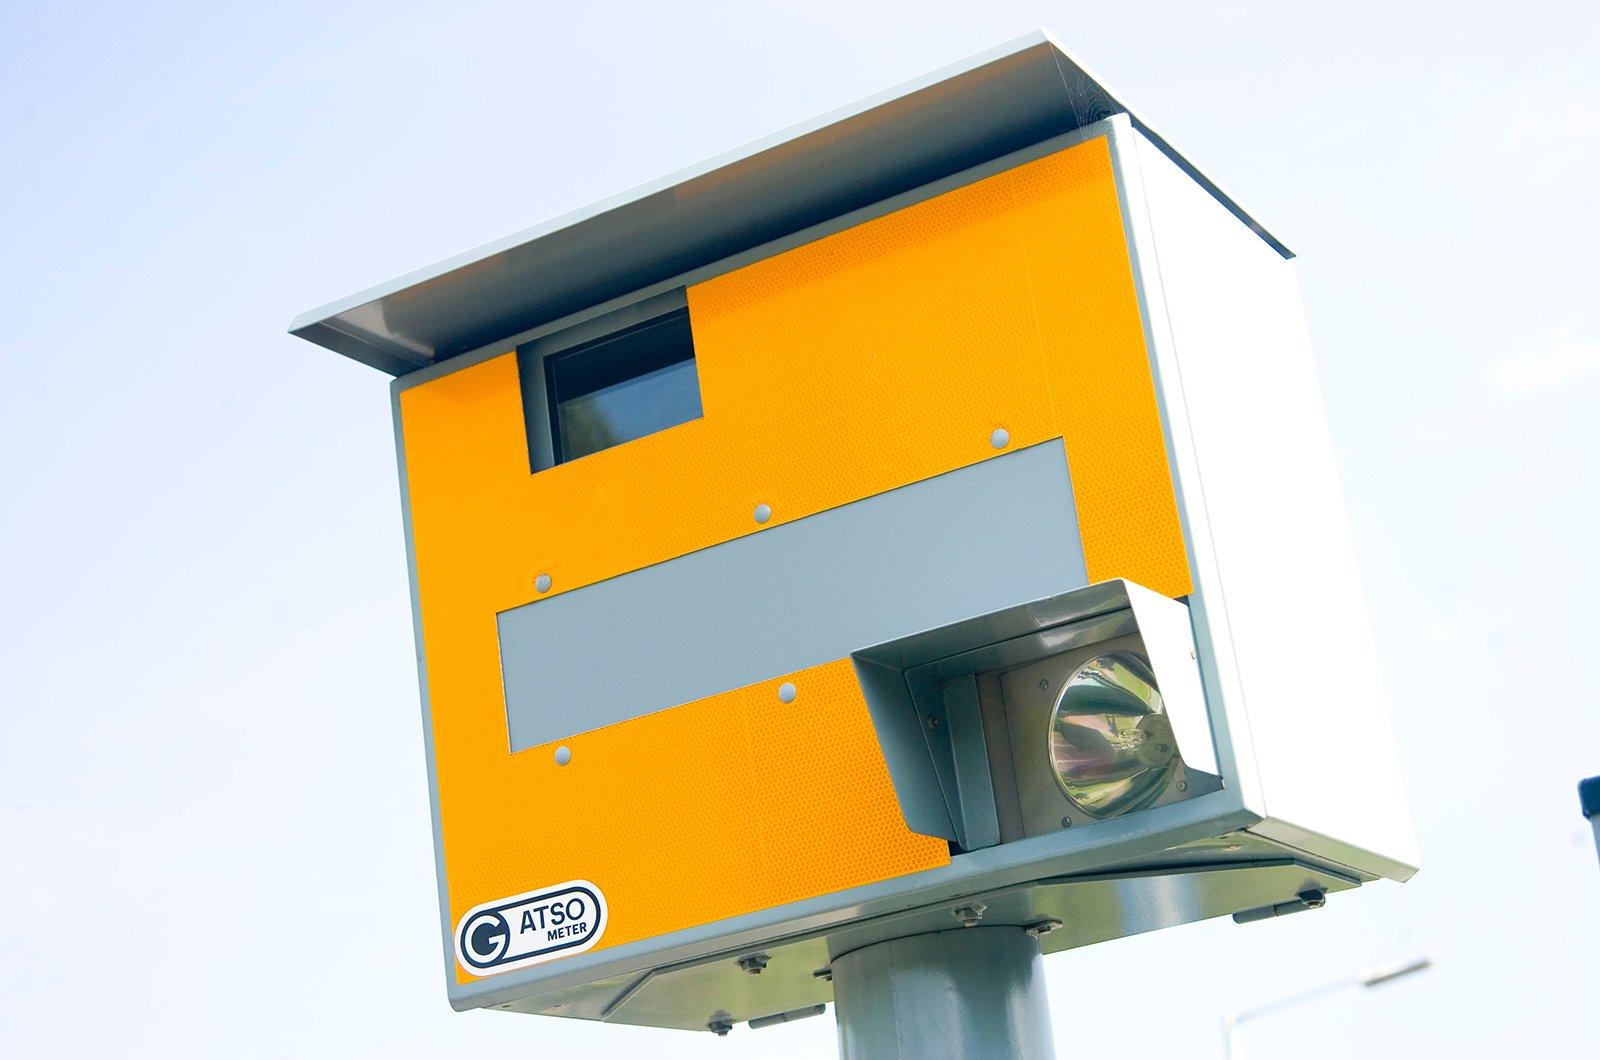 Gatso speed camera